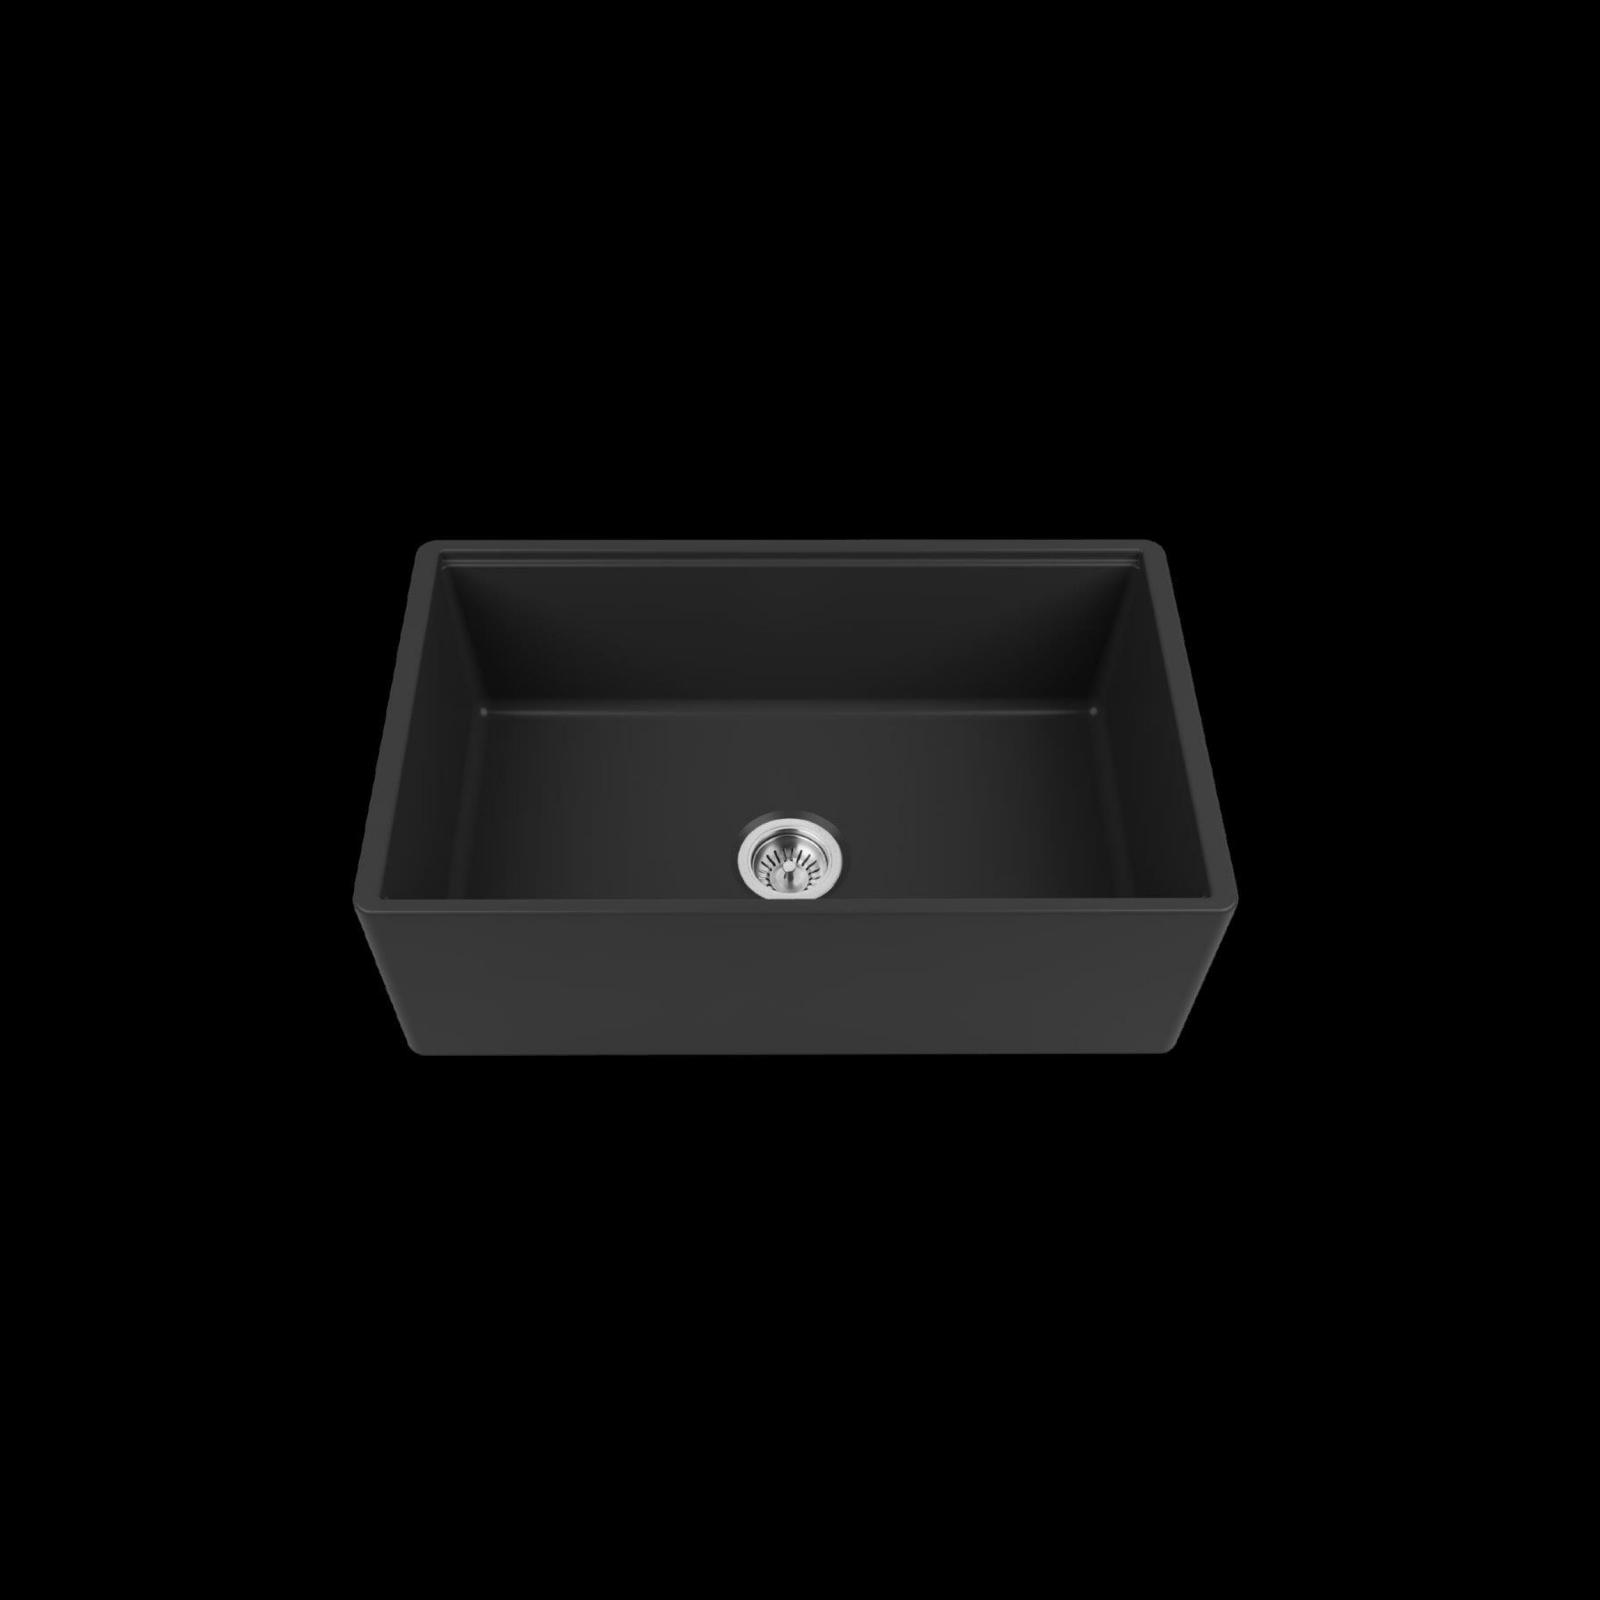 High-quality sink Louis Le Grand I black - single bowl, ceramic - 2